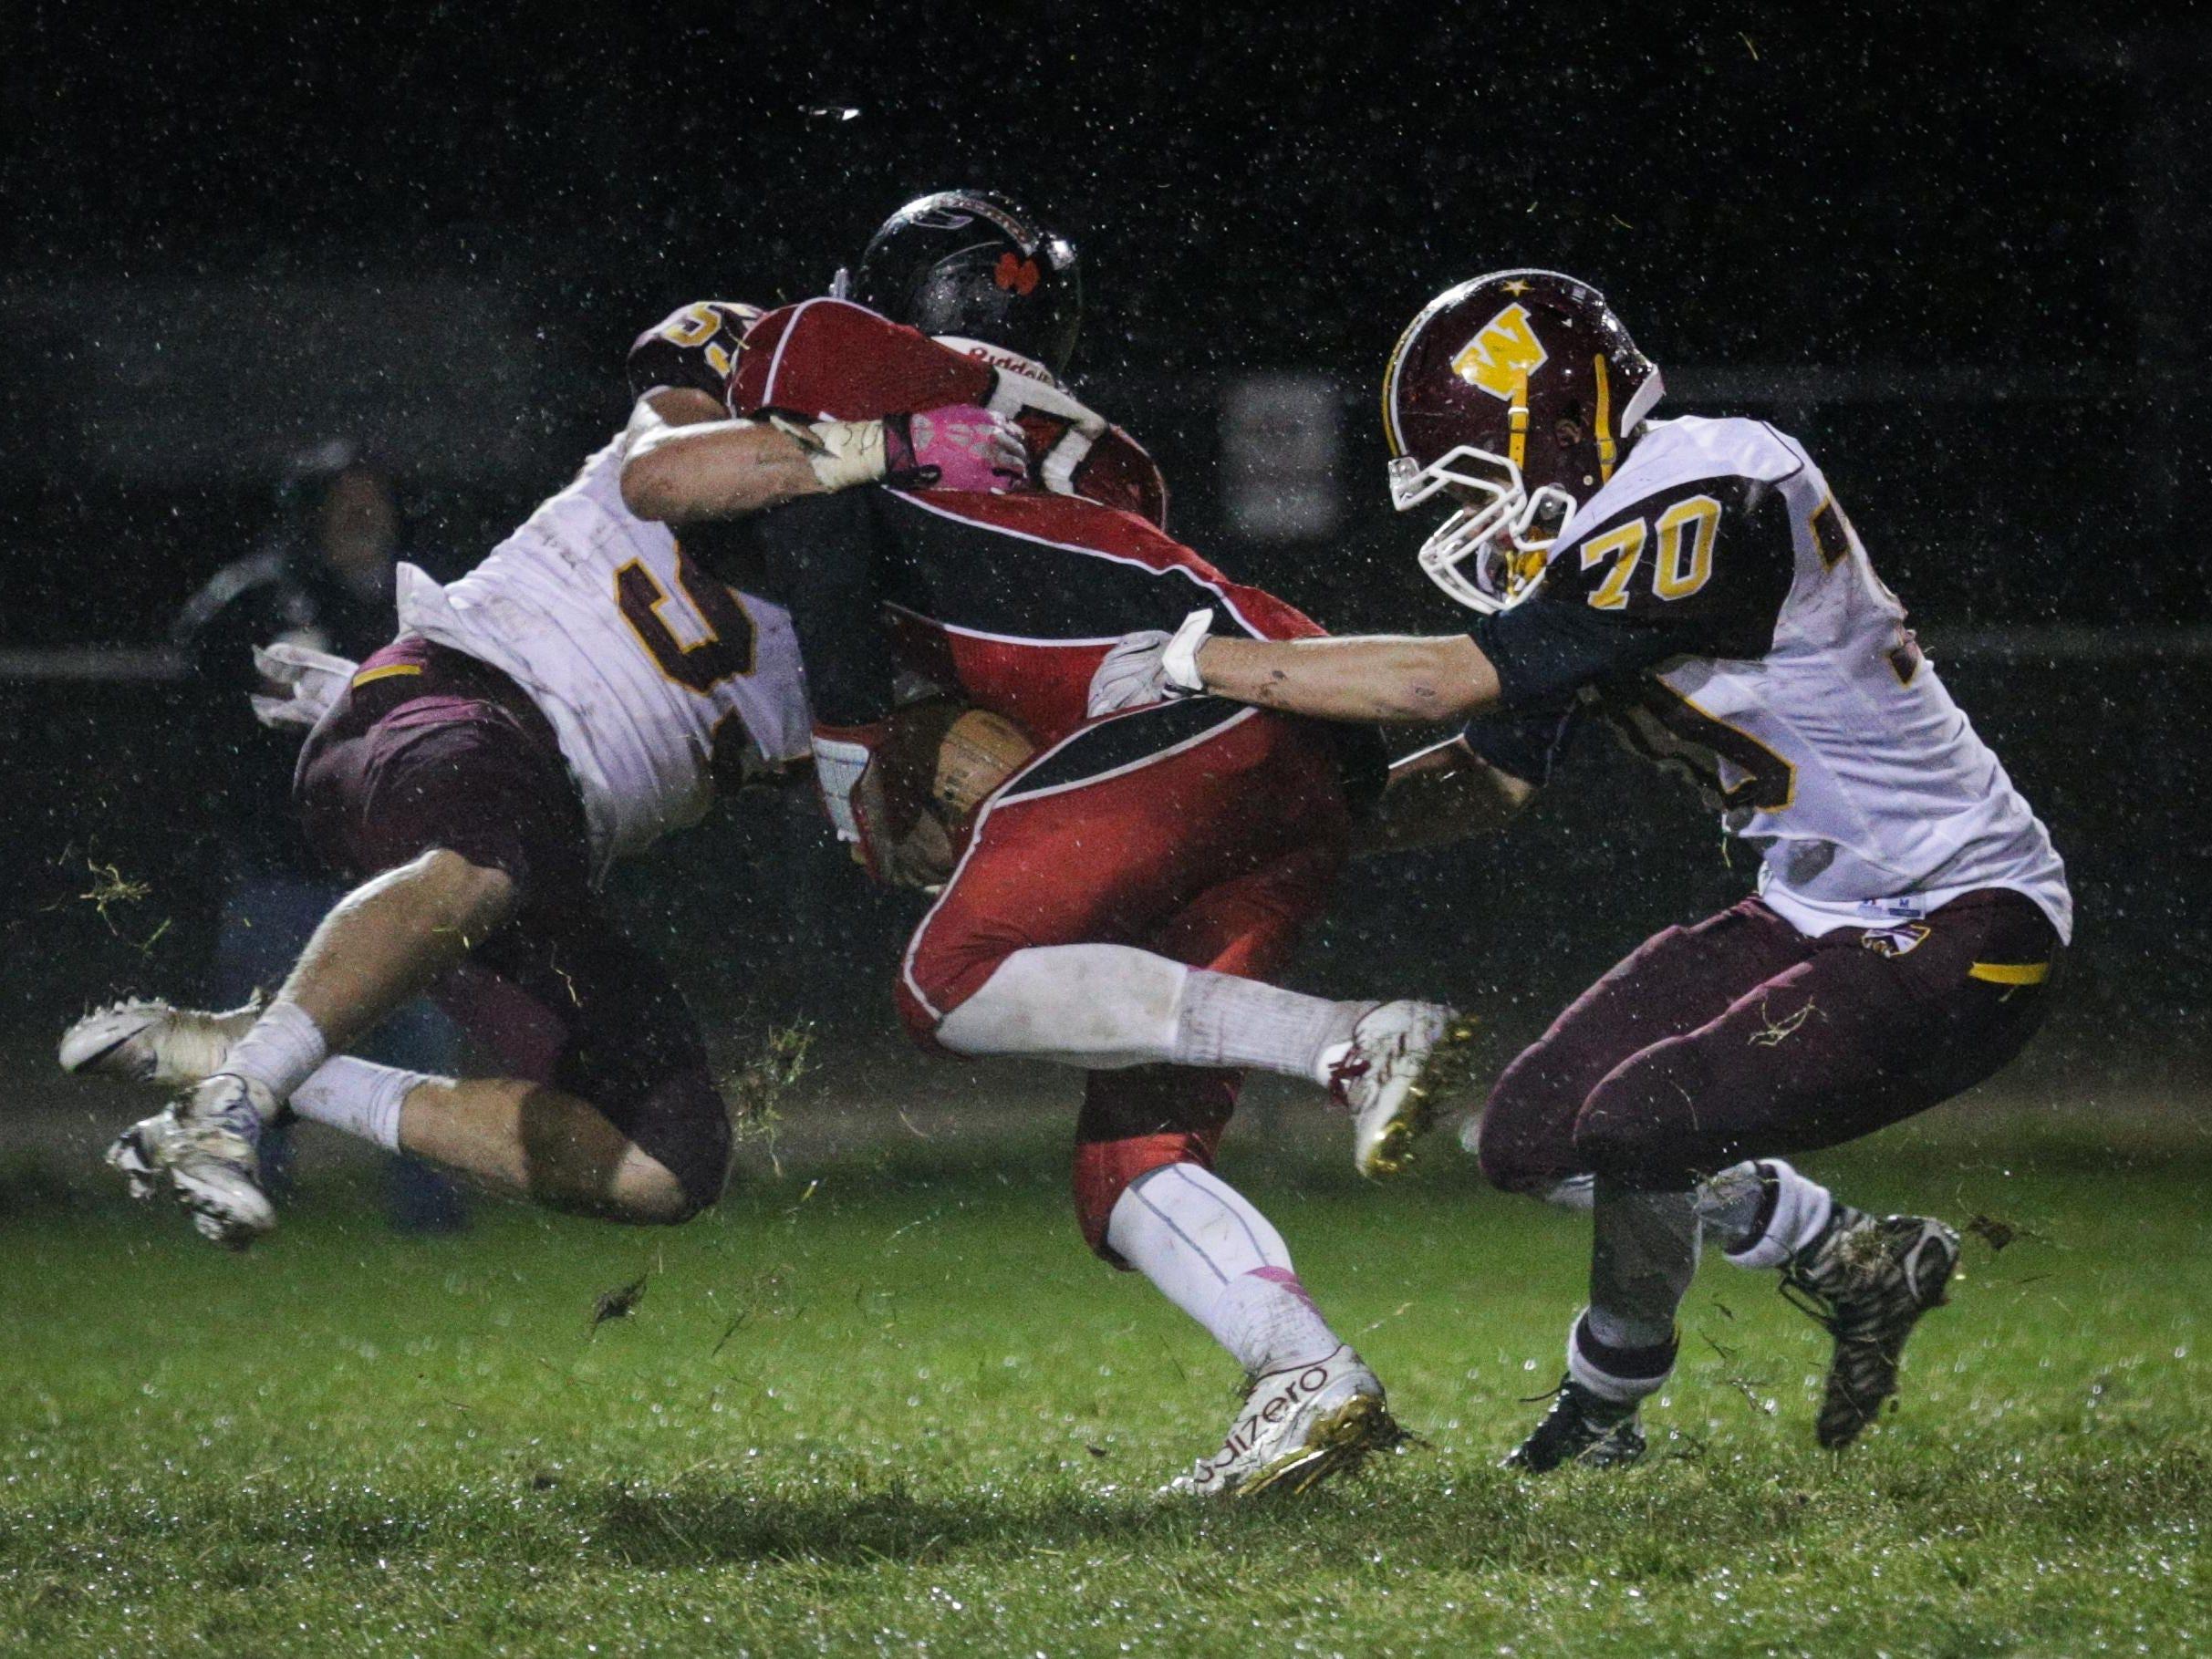 Windsor High School defenders Storm Fox, left, and Jesse Rhodes, sack Loveland High School quarterback Ayden Eberhardt during the third quarter in Loveland Colo. on Oct. 22, 2015.